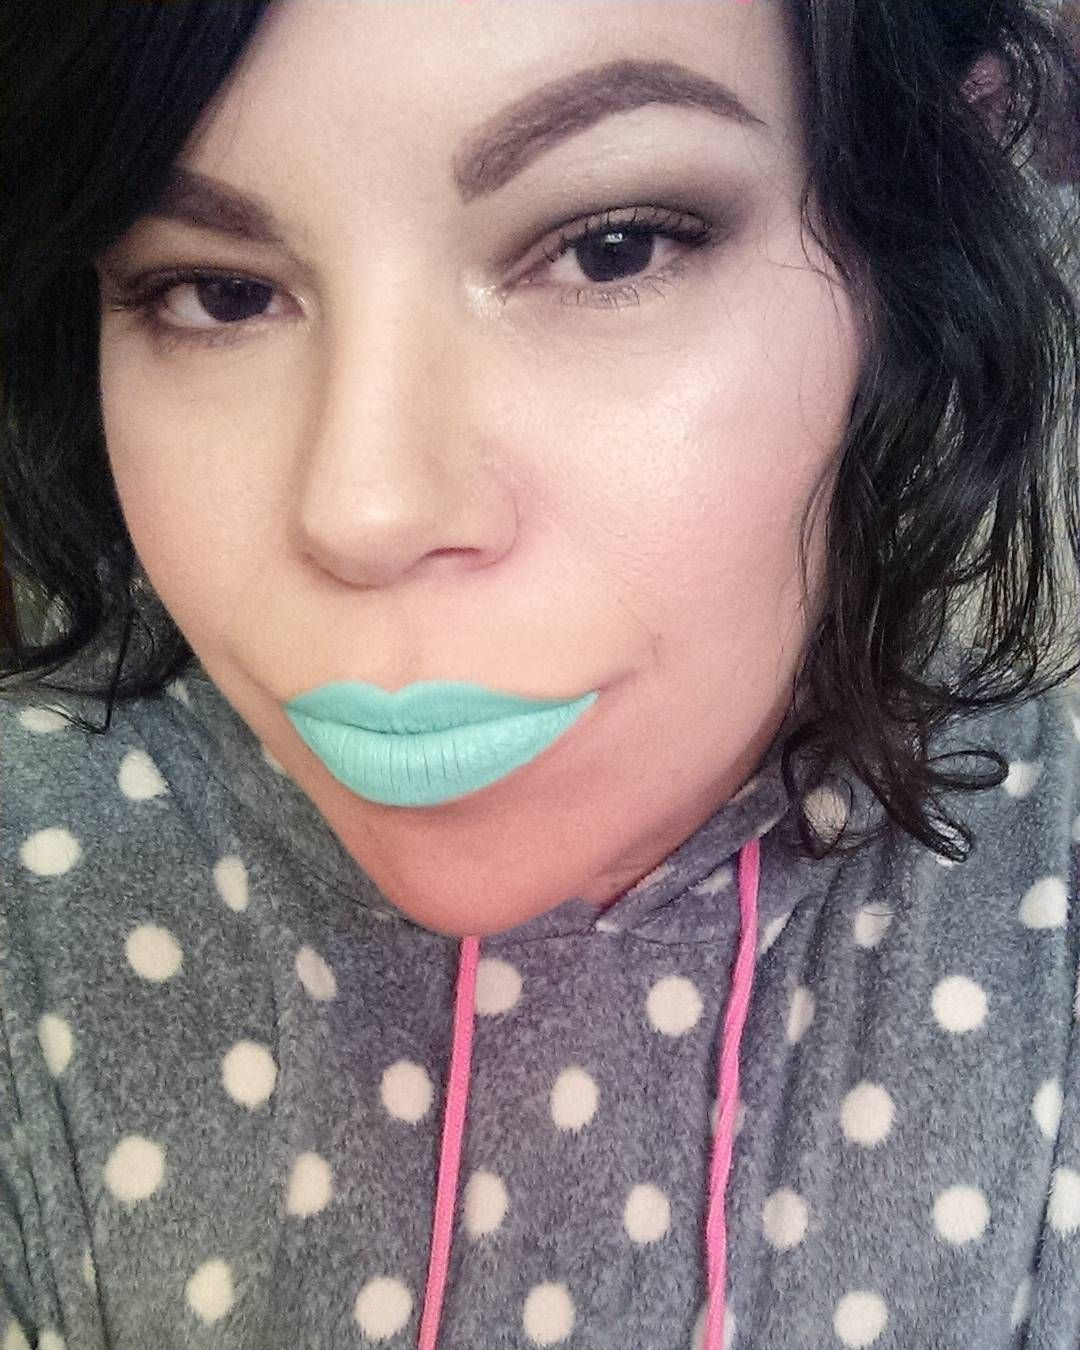 Max Makeup Cherimoya liquid lipstick in light blue / aqua. From the ...